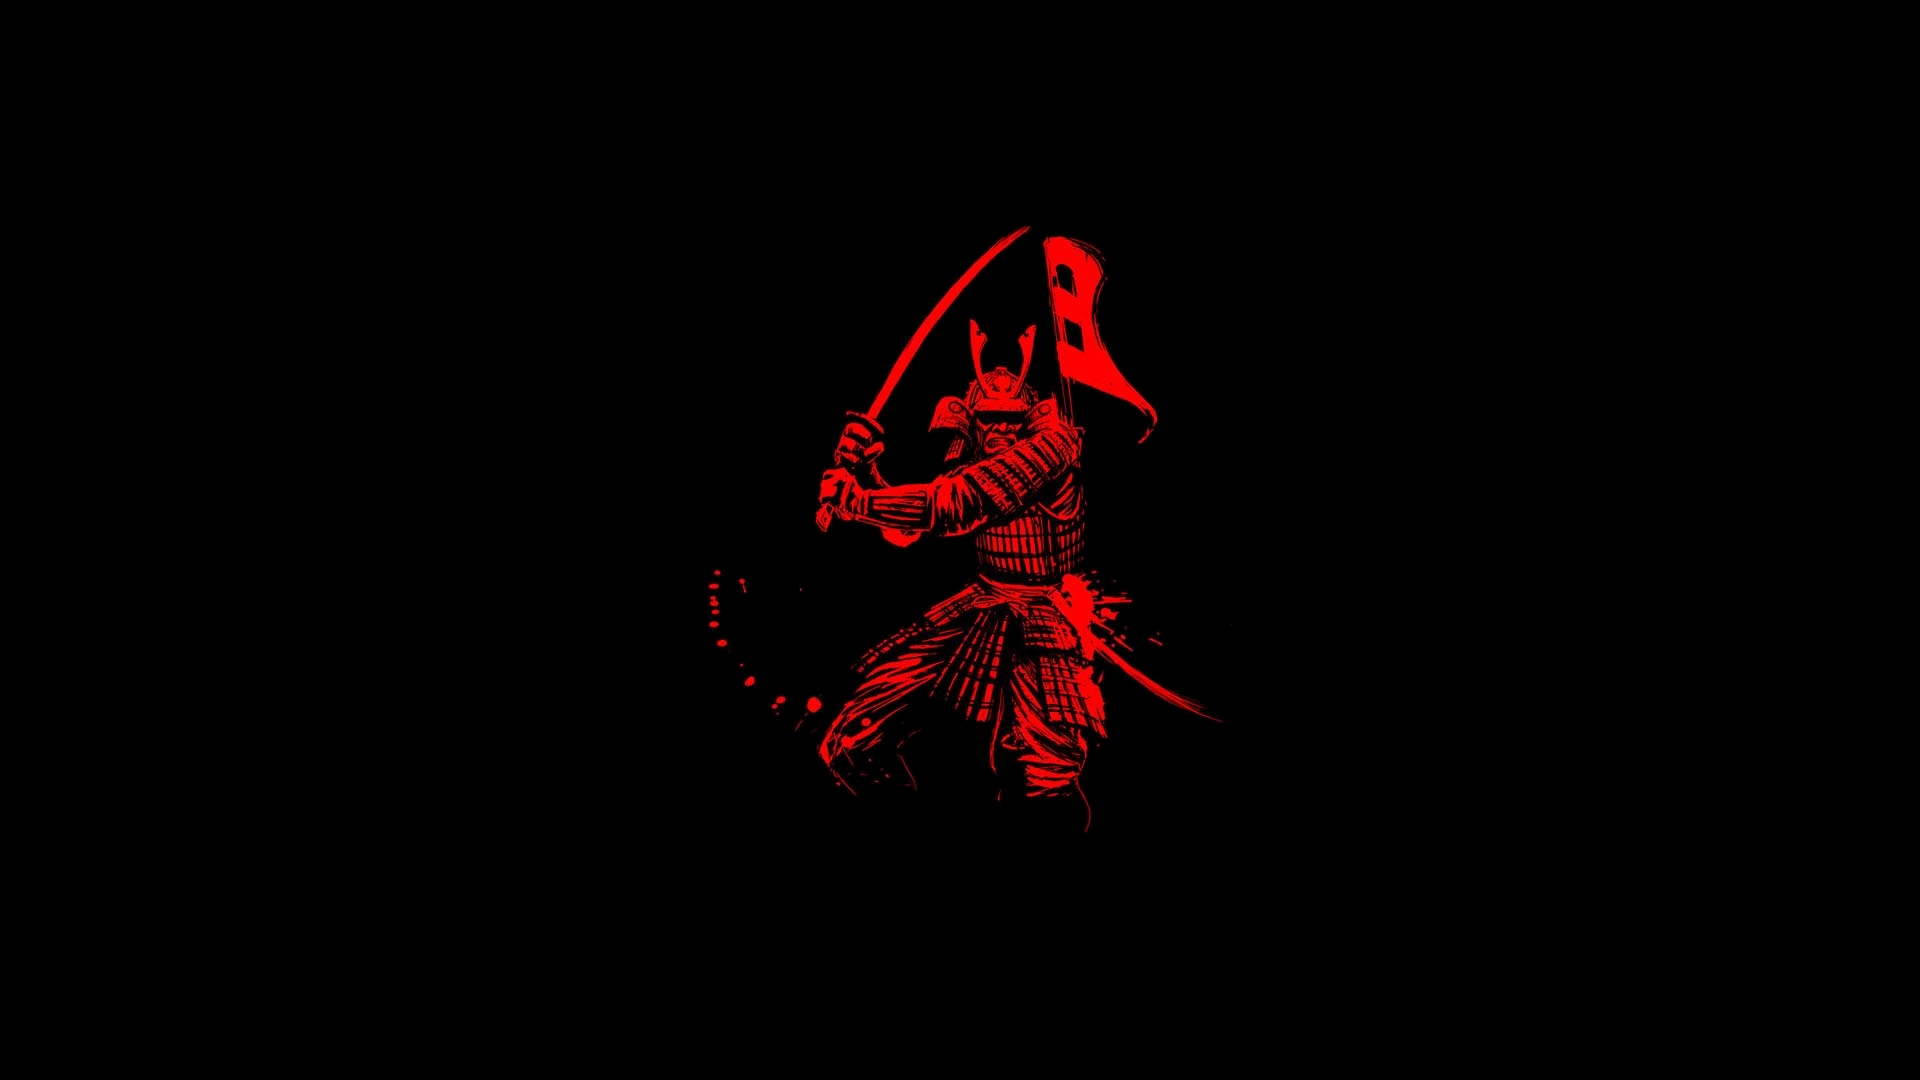 Samurai Wallpapers Sfondi 1920x1080 ID511161 1920x1080